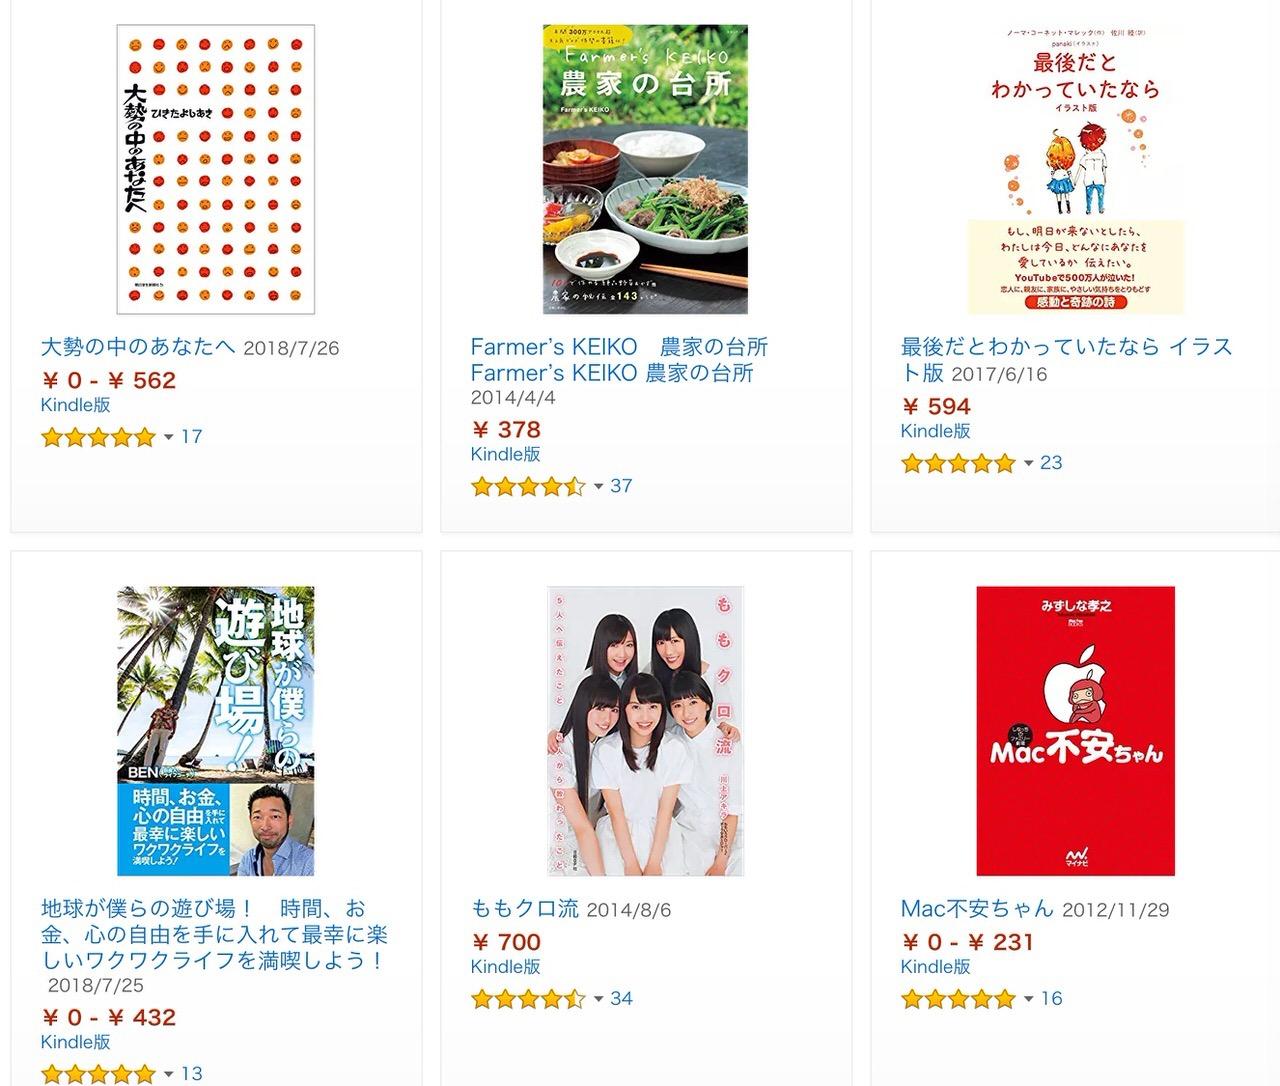 【Kindleセール】20,000冊以上が対象!50%OFF以上「冬のKindle本セール」